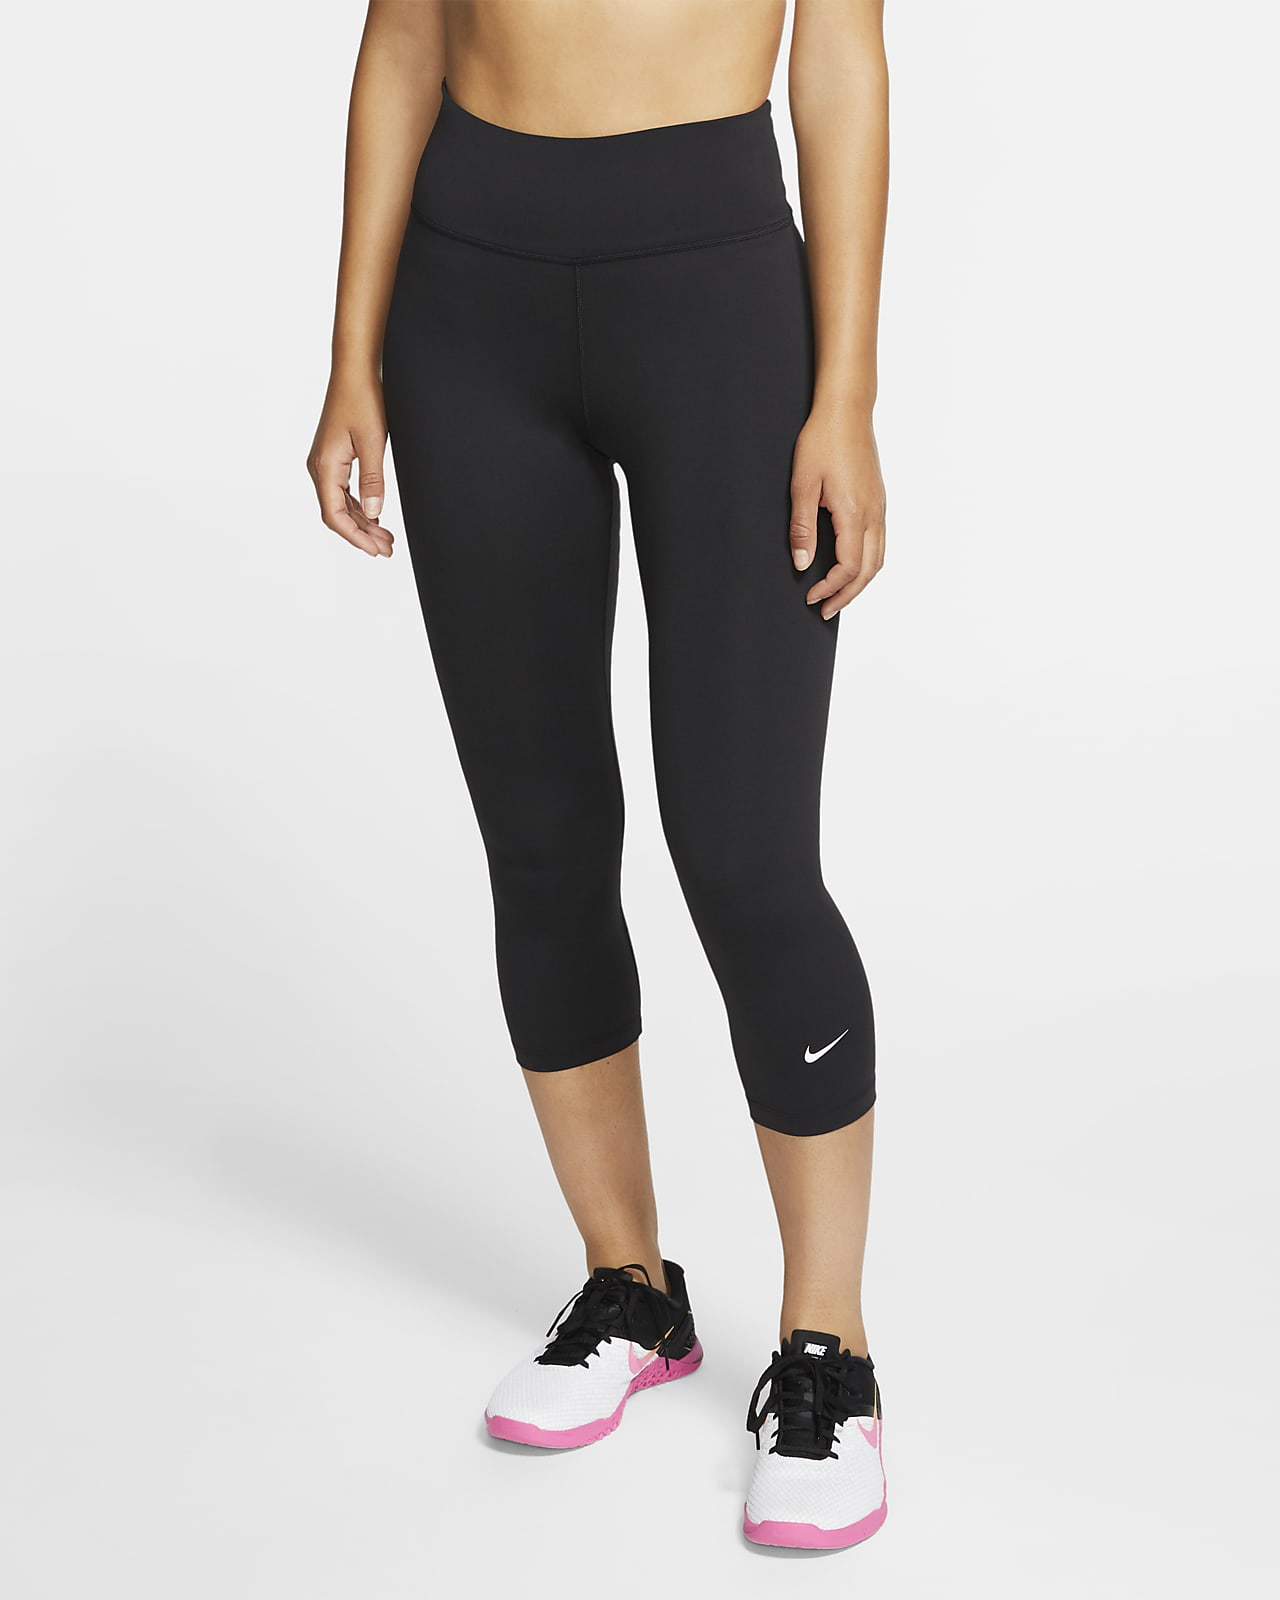 Nike One Women's Capris. Nike.com